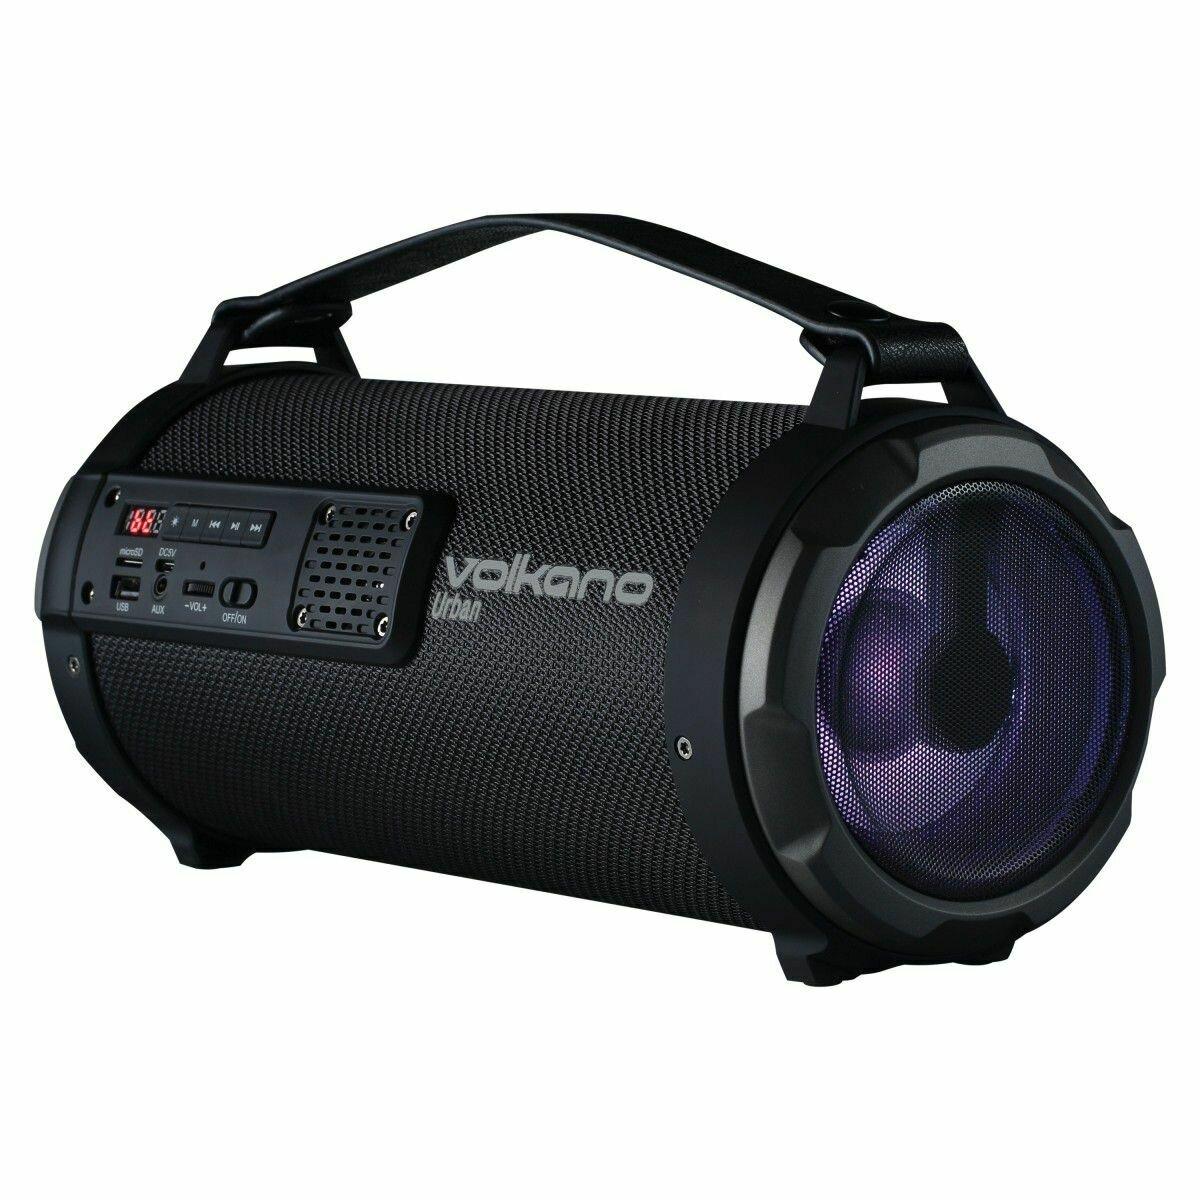 Volkano Urban Series Fabric Tube Bluetooth Speaker - Black